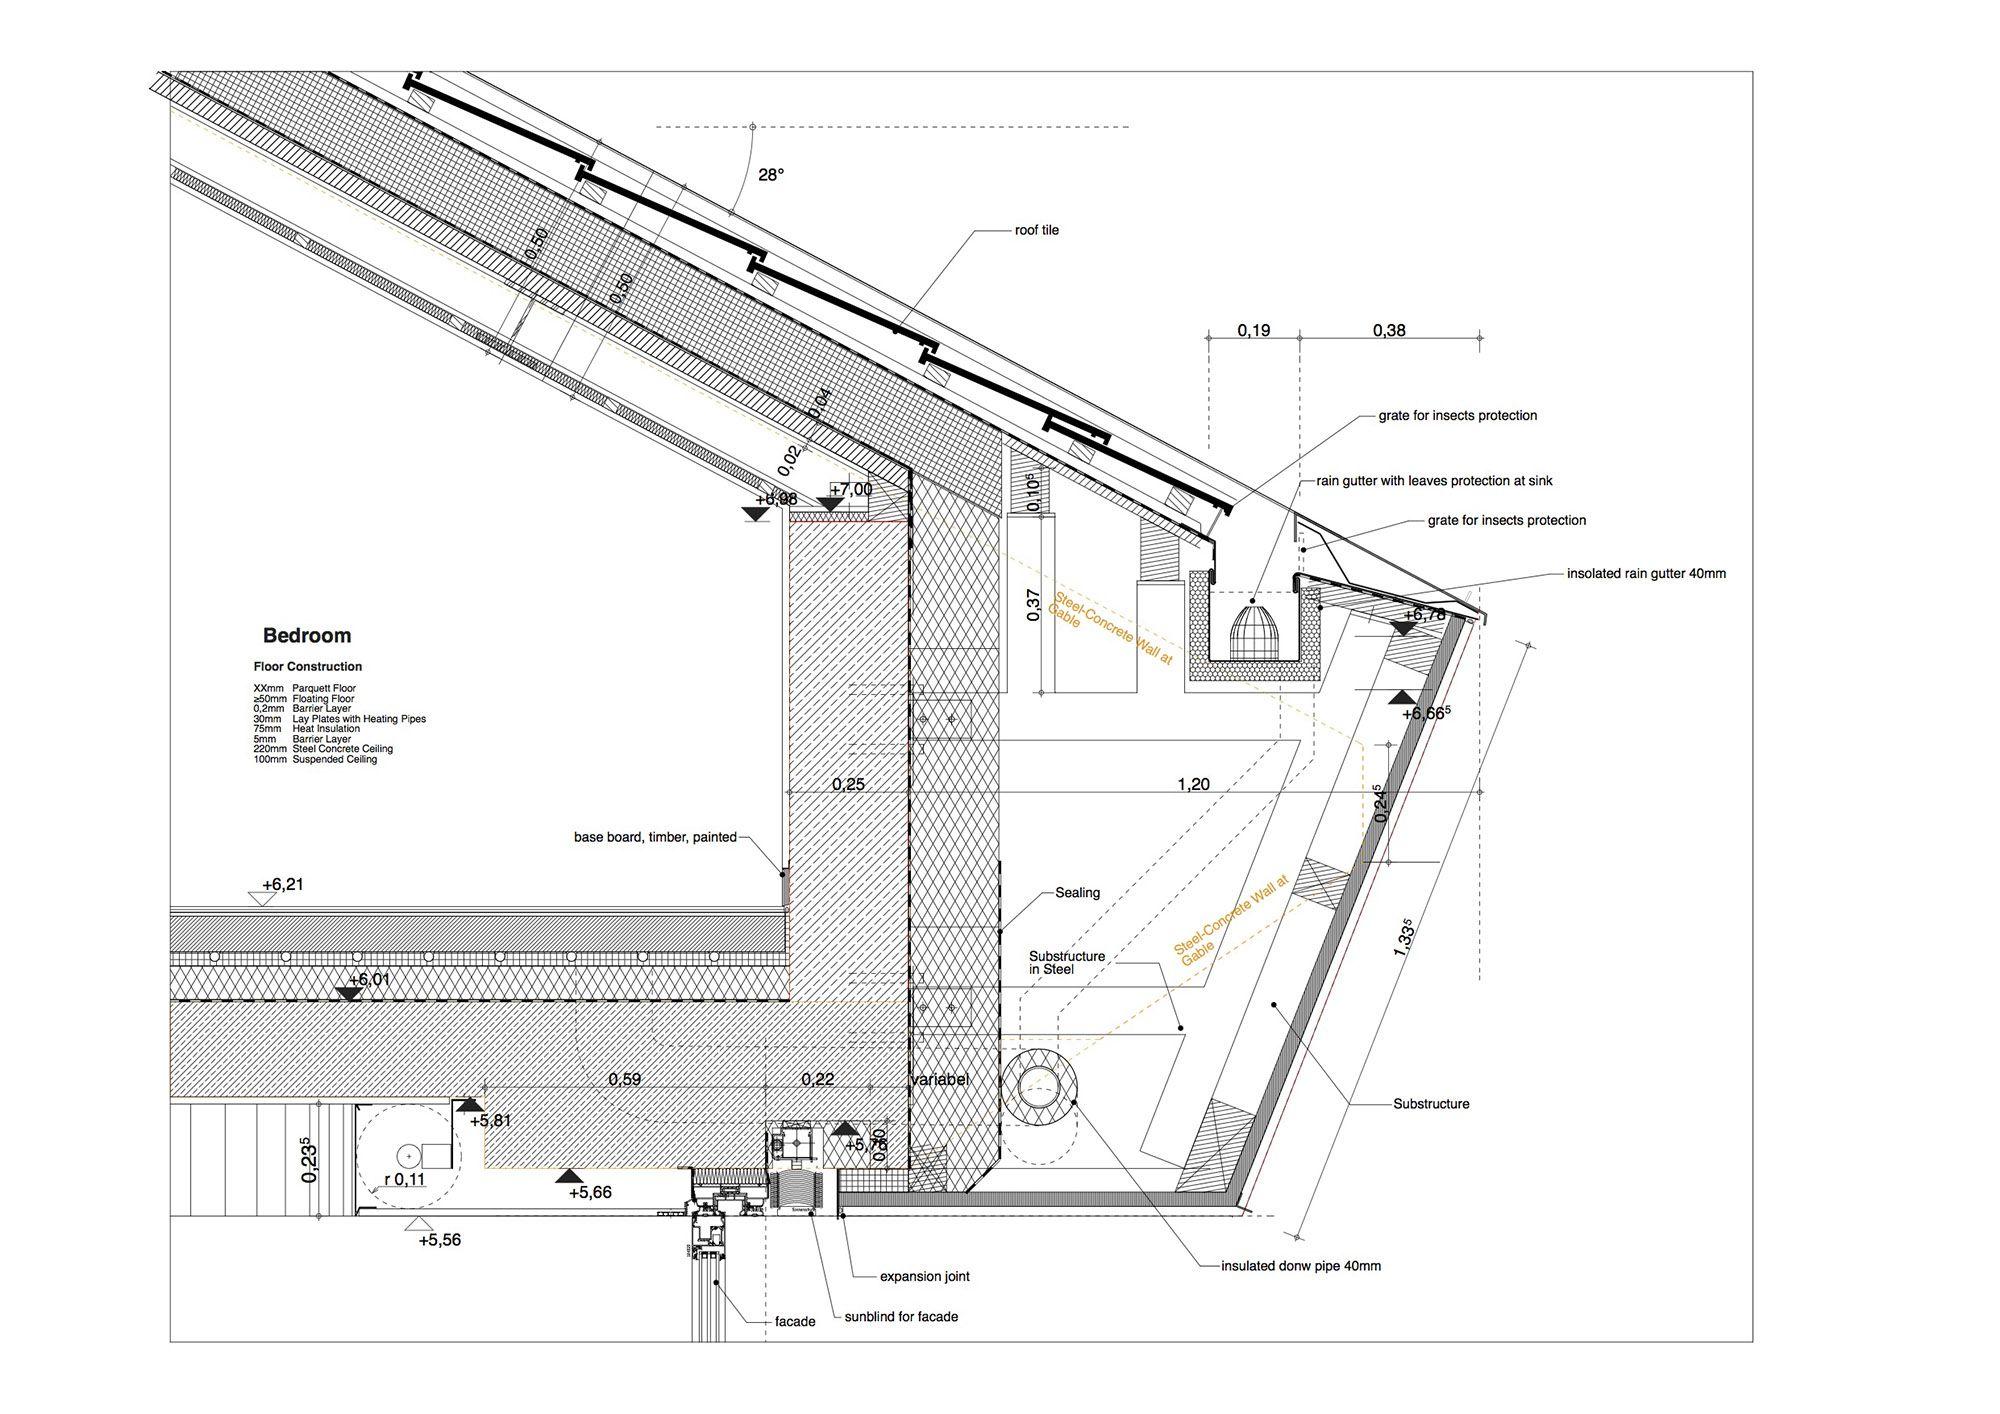 OLS Scale M10 A3 Roof 01